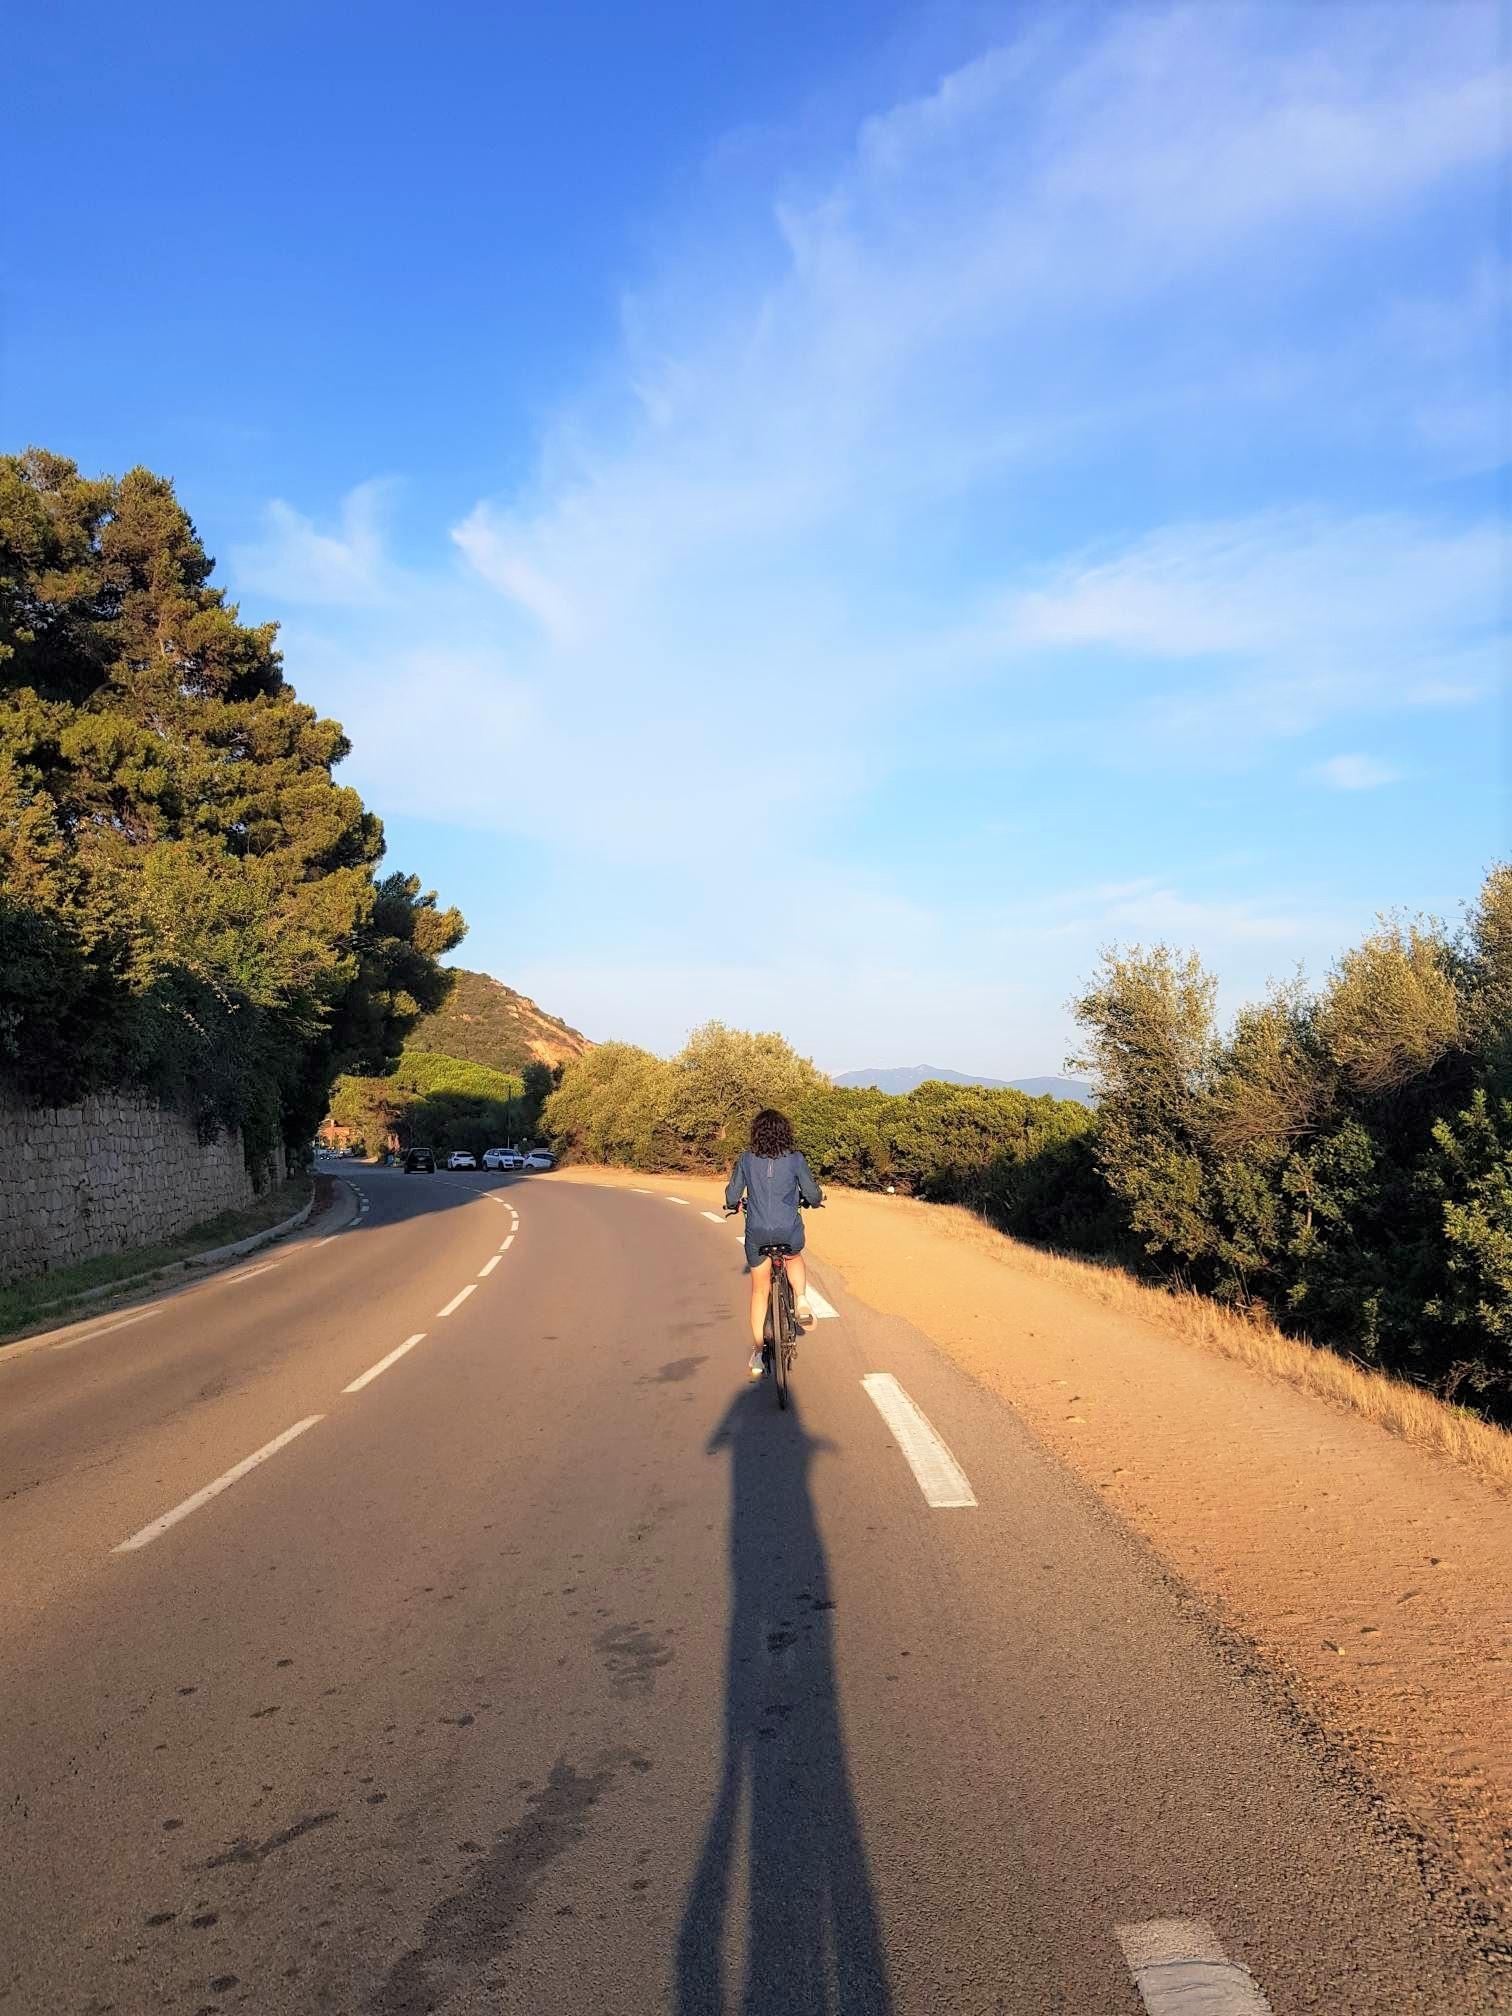 Blog voyage Corse slow travel clioandco tourisme